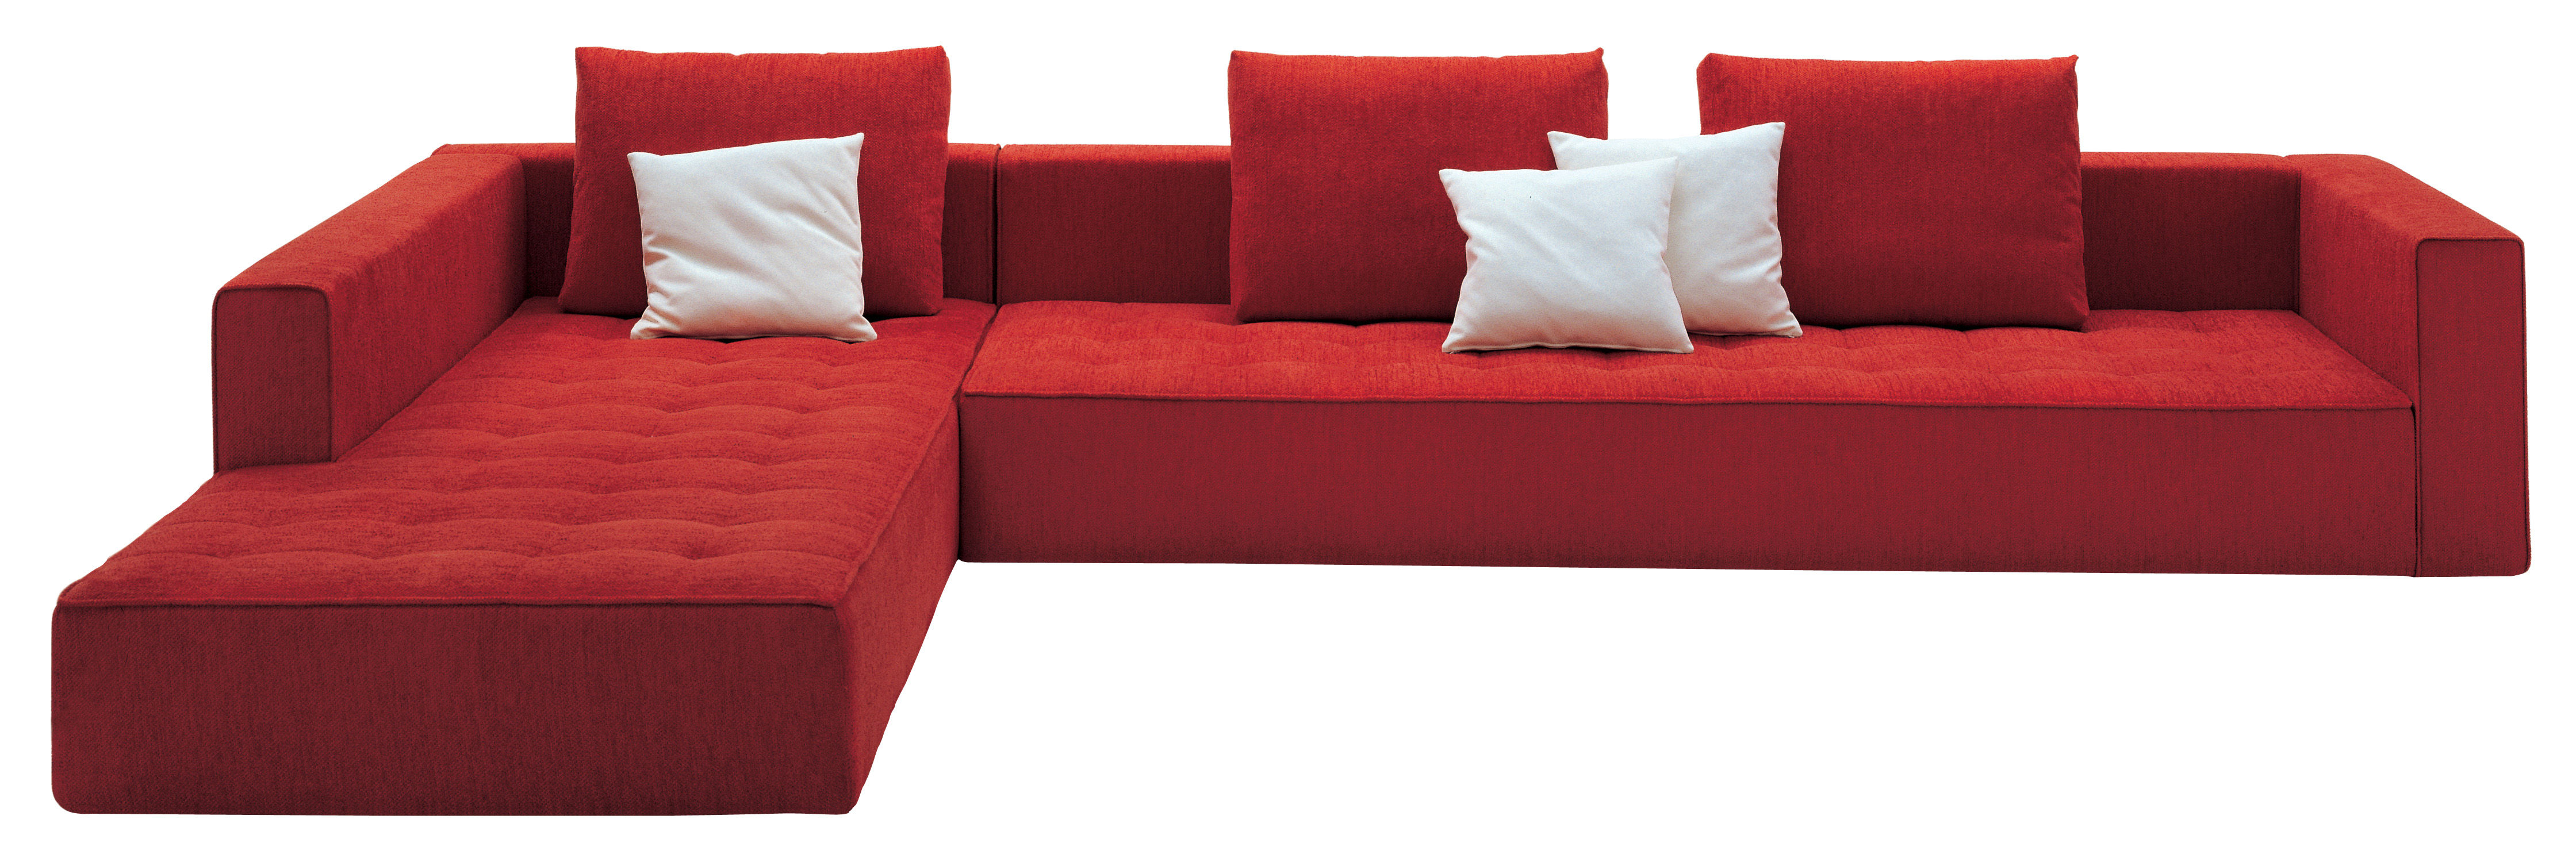 Canap d 39 angle kilt tissu l 300 cm tissu rouge zanotta for Canape zanotta